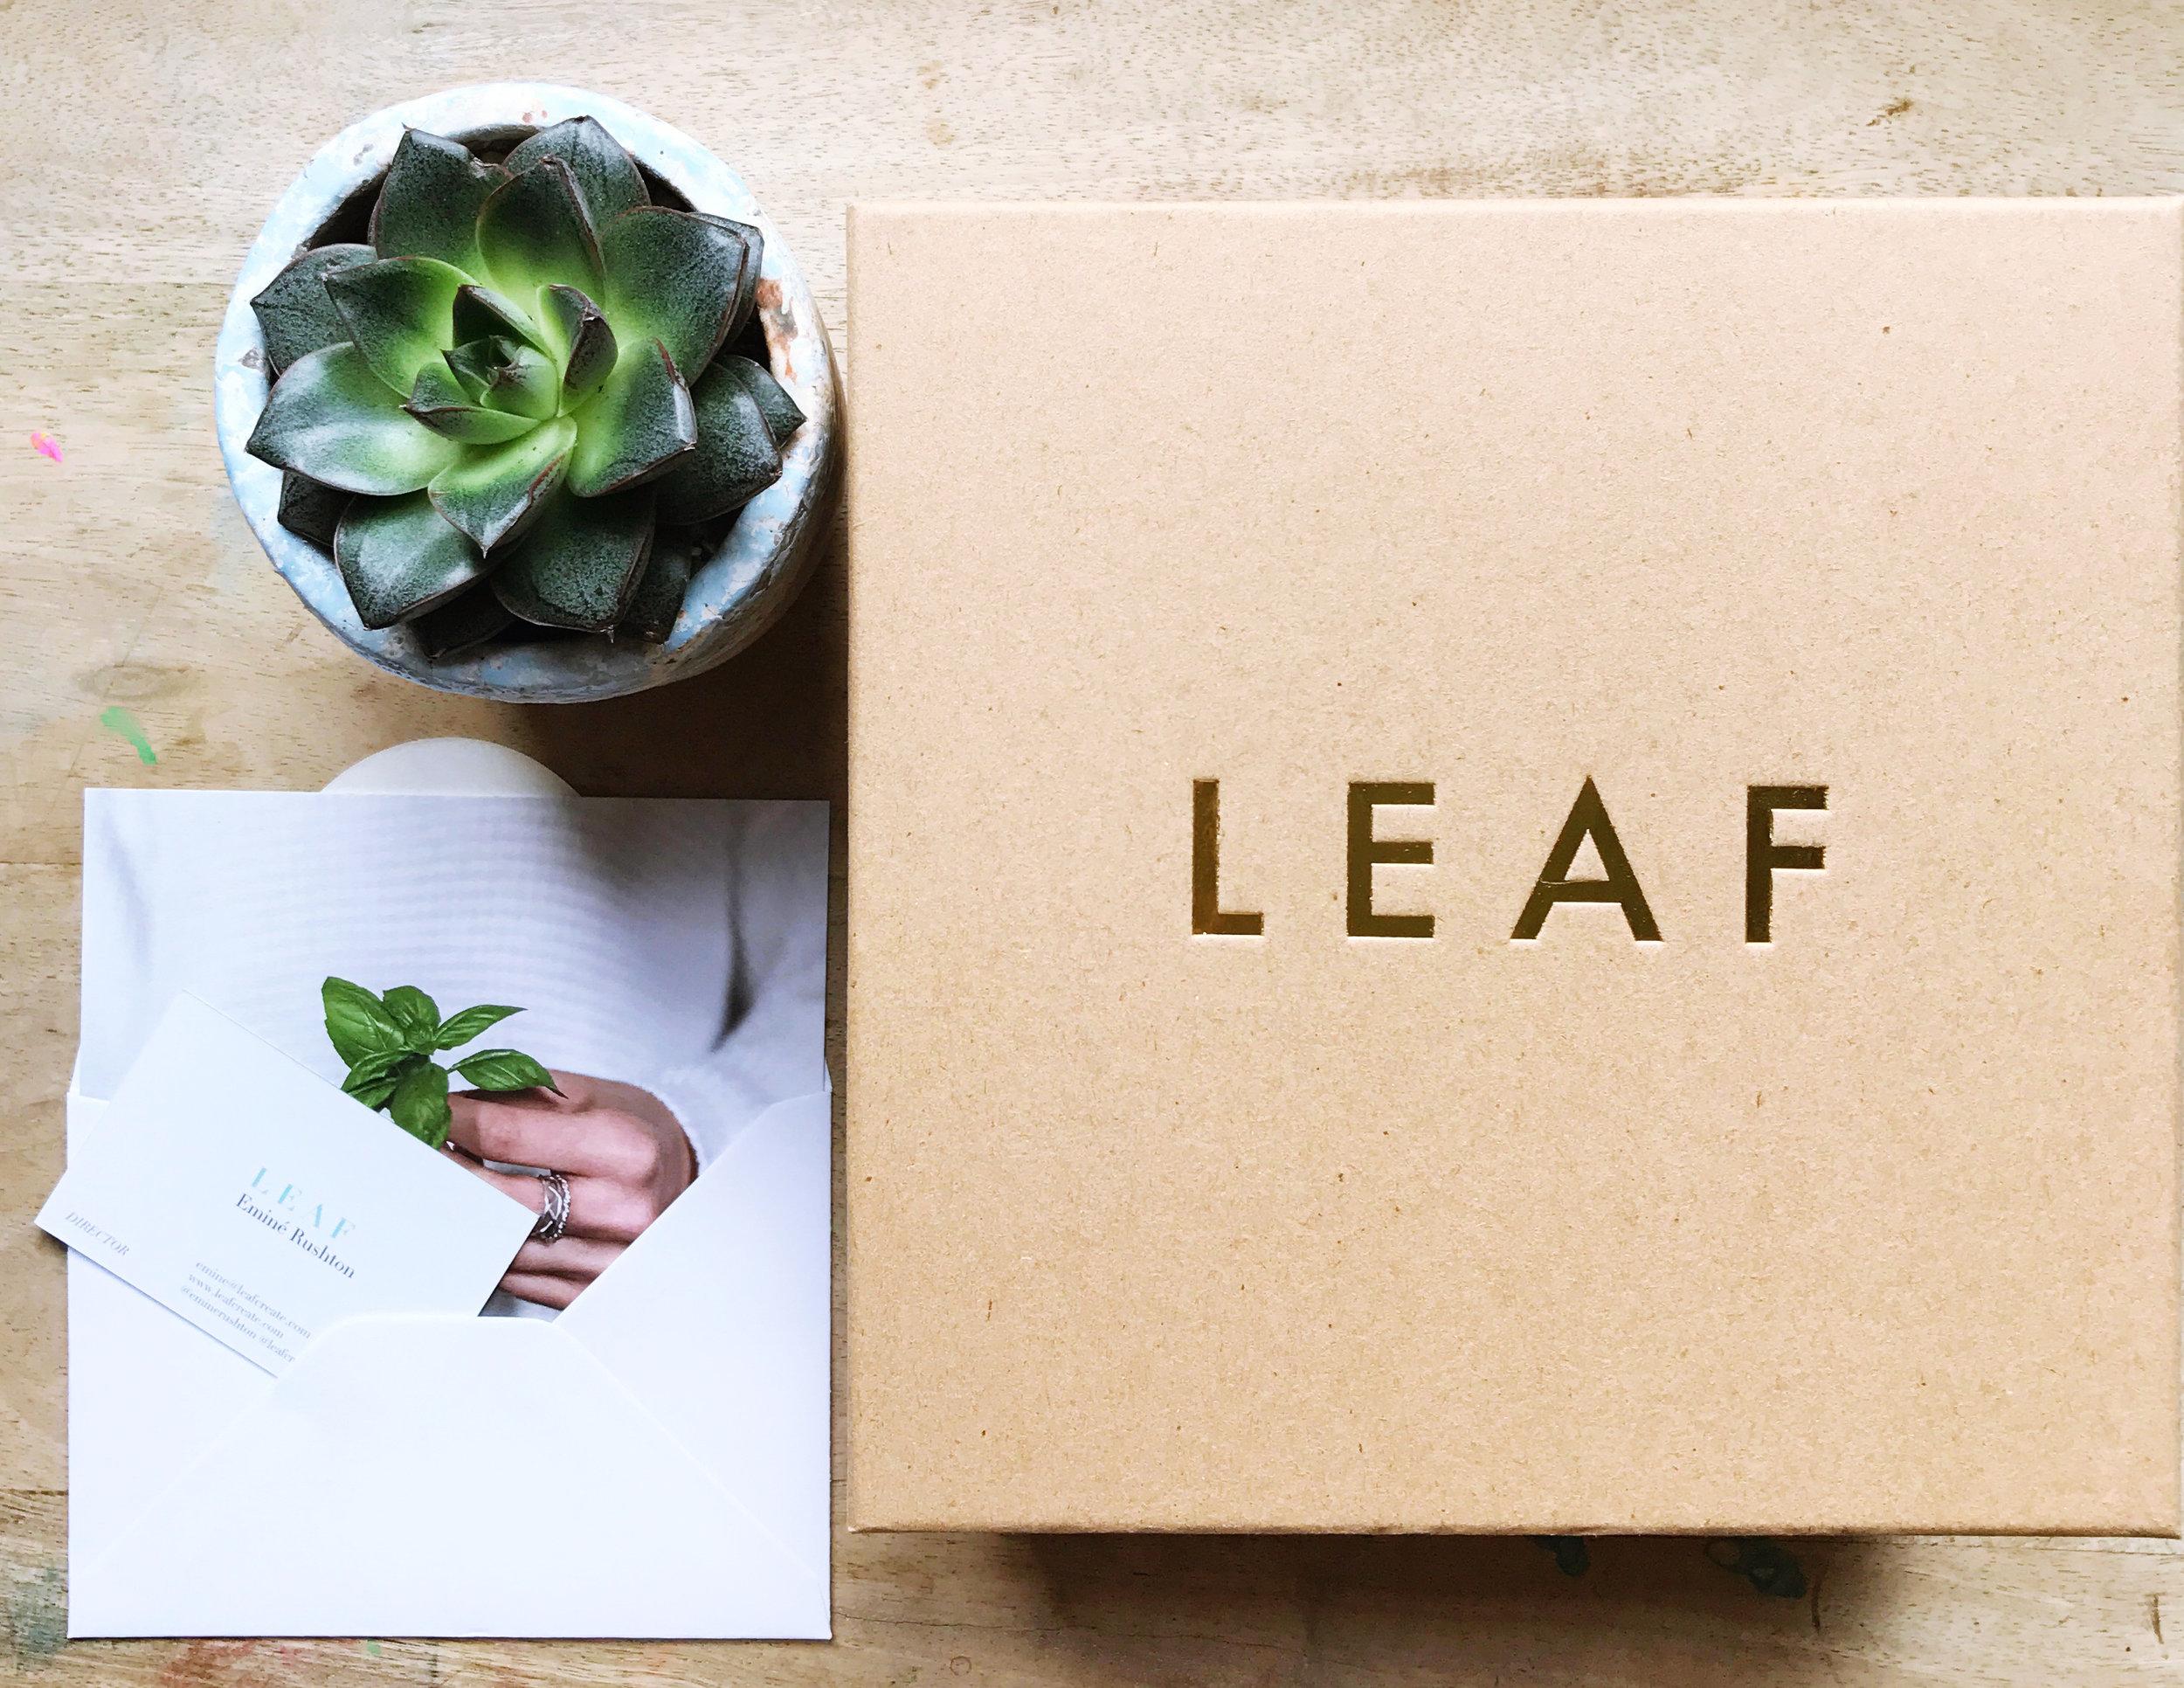 LEAF card + box + cactus.jpg